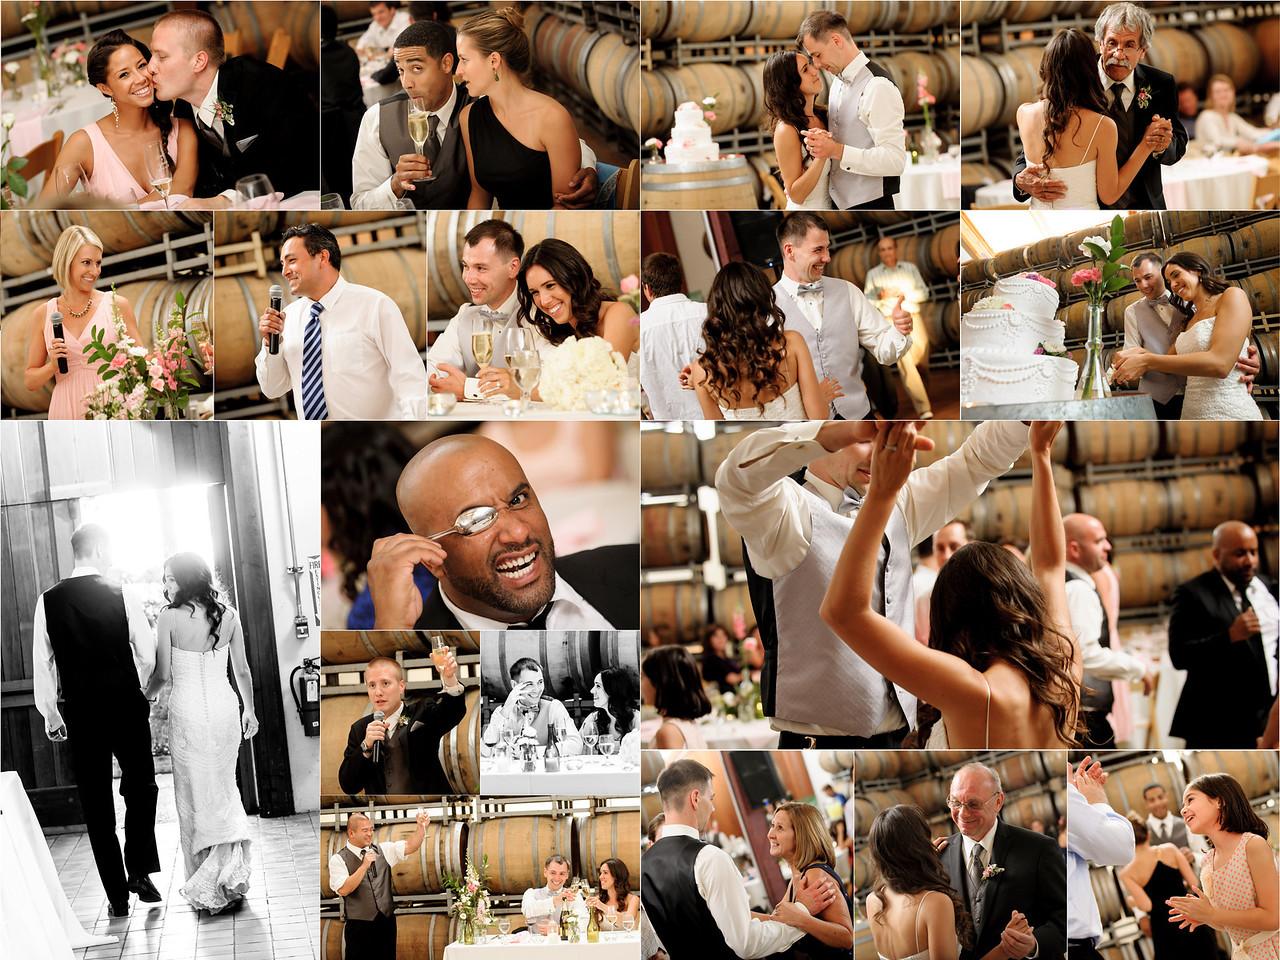 Jenny_and_Dimitriy_Wedding_Photography_4x6_Photo_Board_07